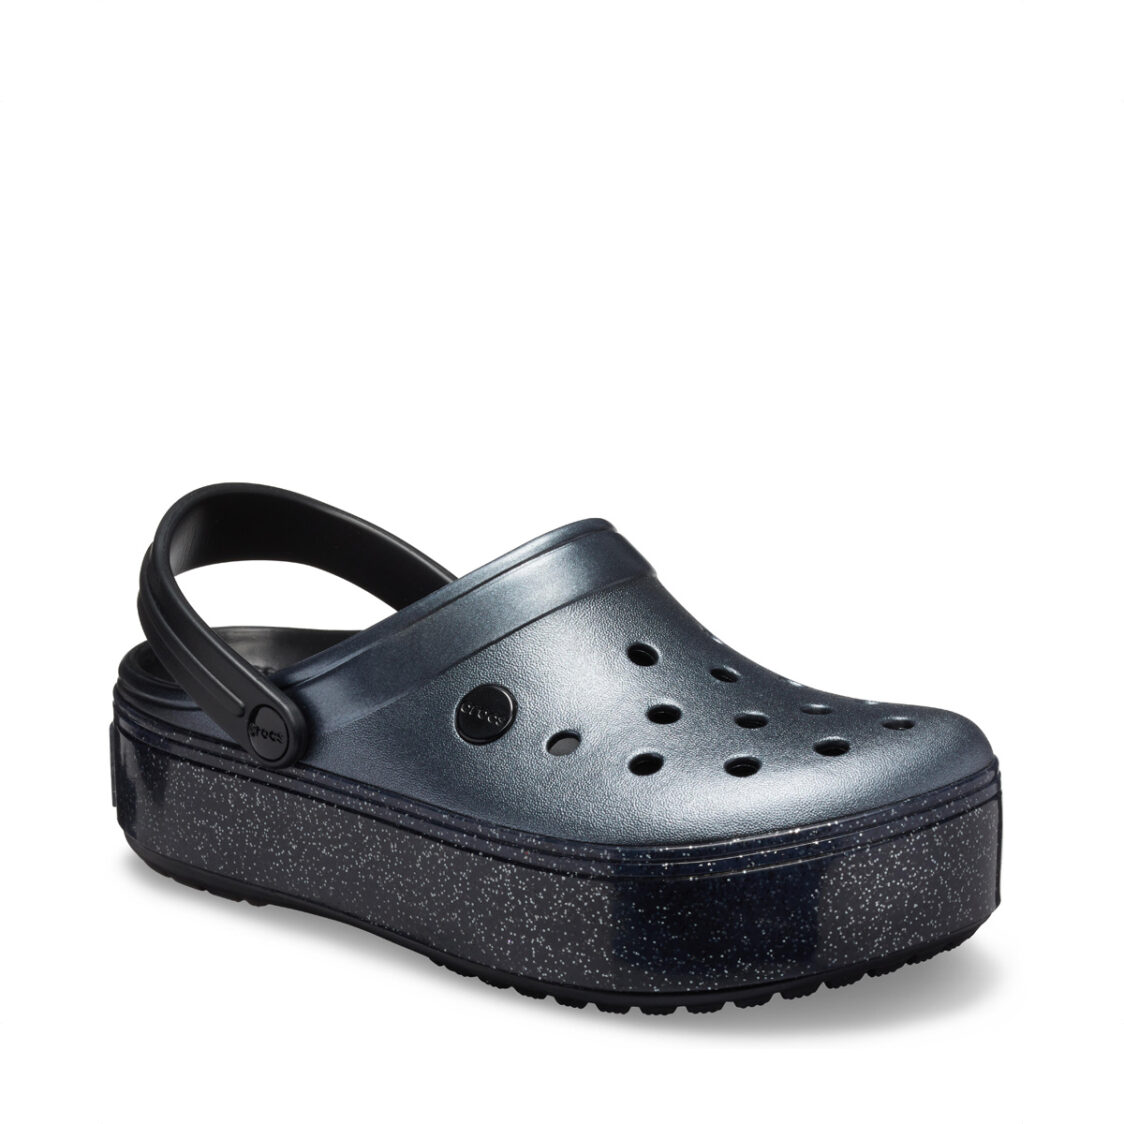 Crocs Crocband Platform Clog 205912-002 Metallic Black